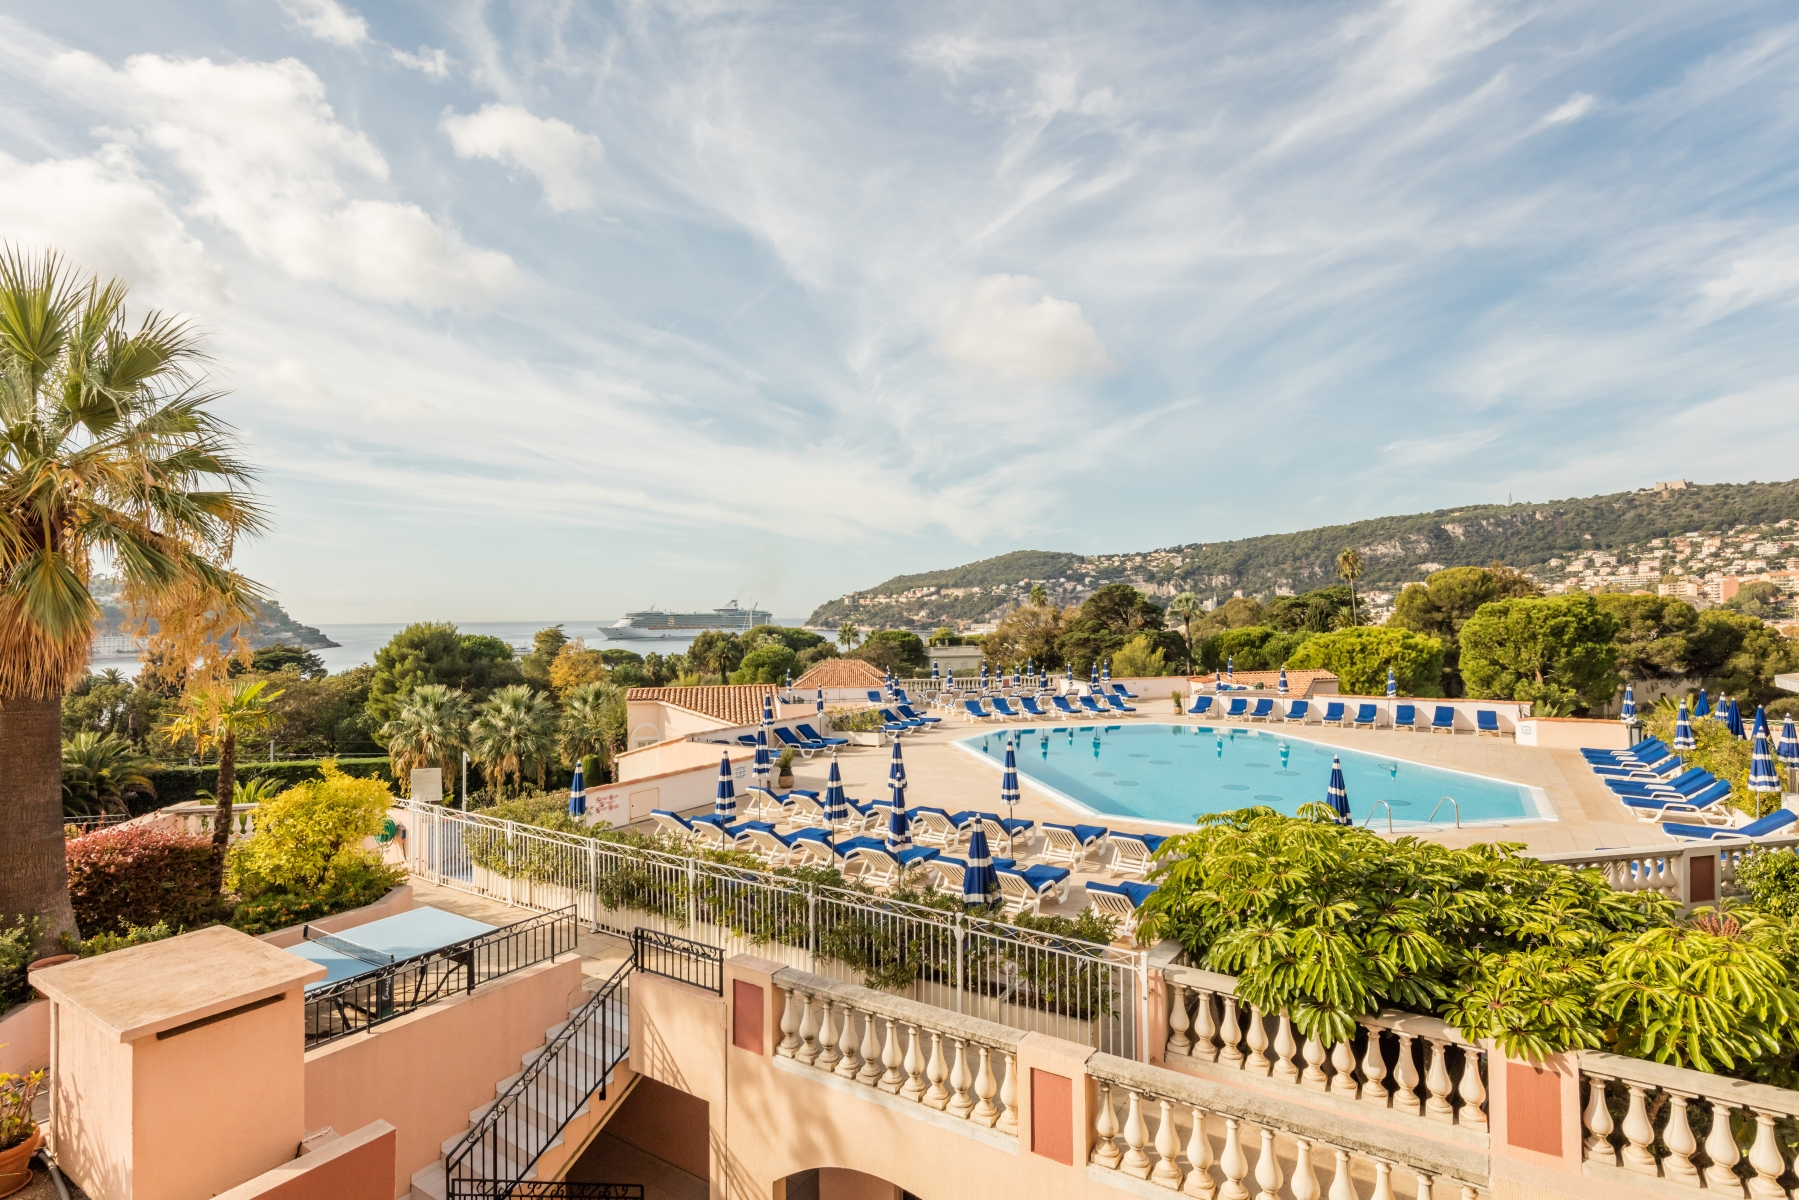 Aanbieding vakantiehuisje Côte d'Azur 🏕️Pierre & Vacances Résidence L'Ange Gardien